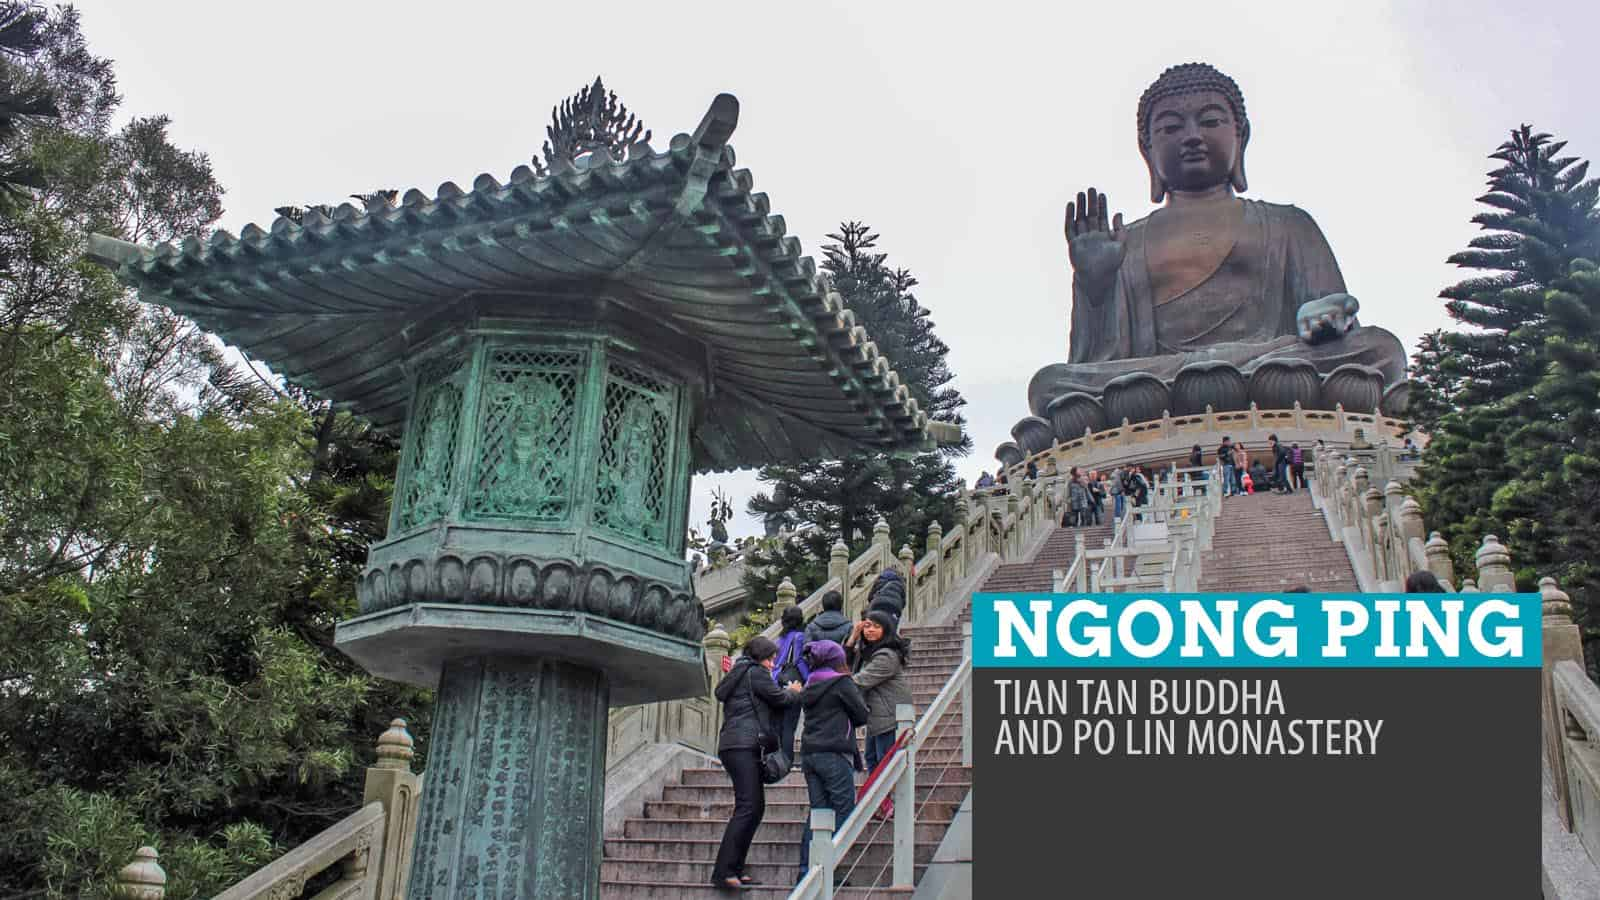 NGONG PING, HONG KONG: Tian Tan Buddha and Po Lin Monastery